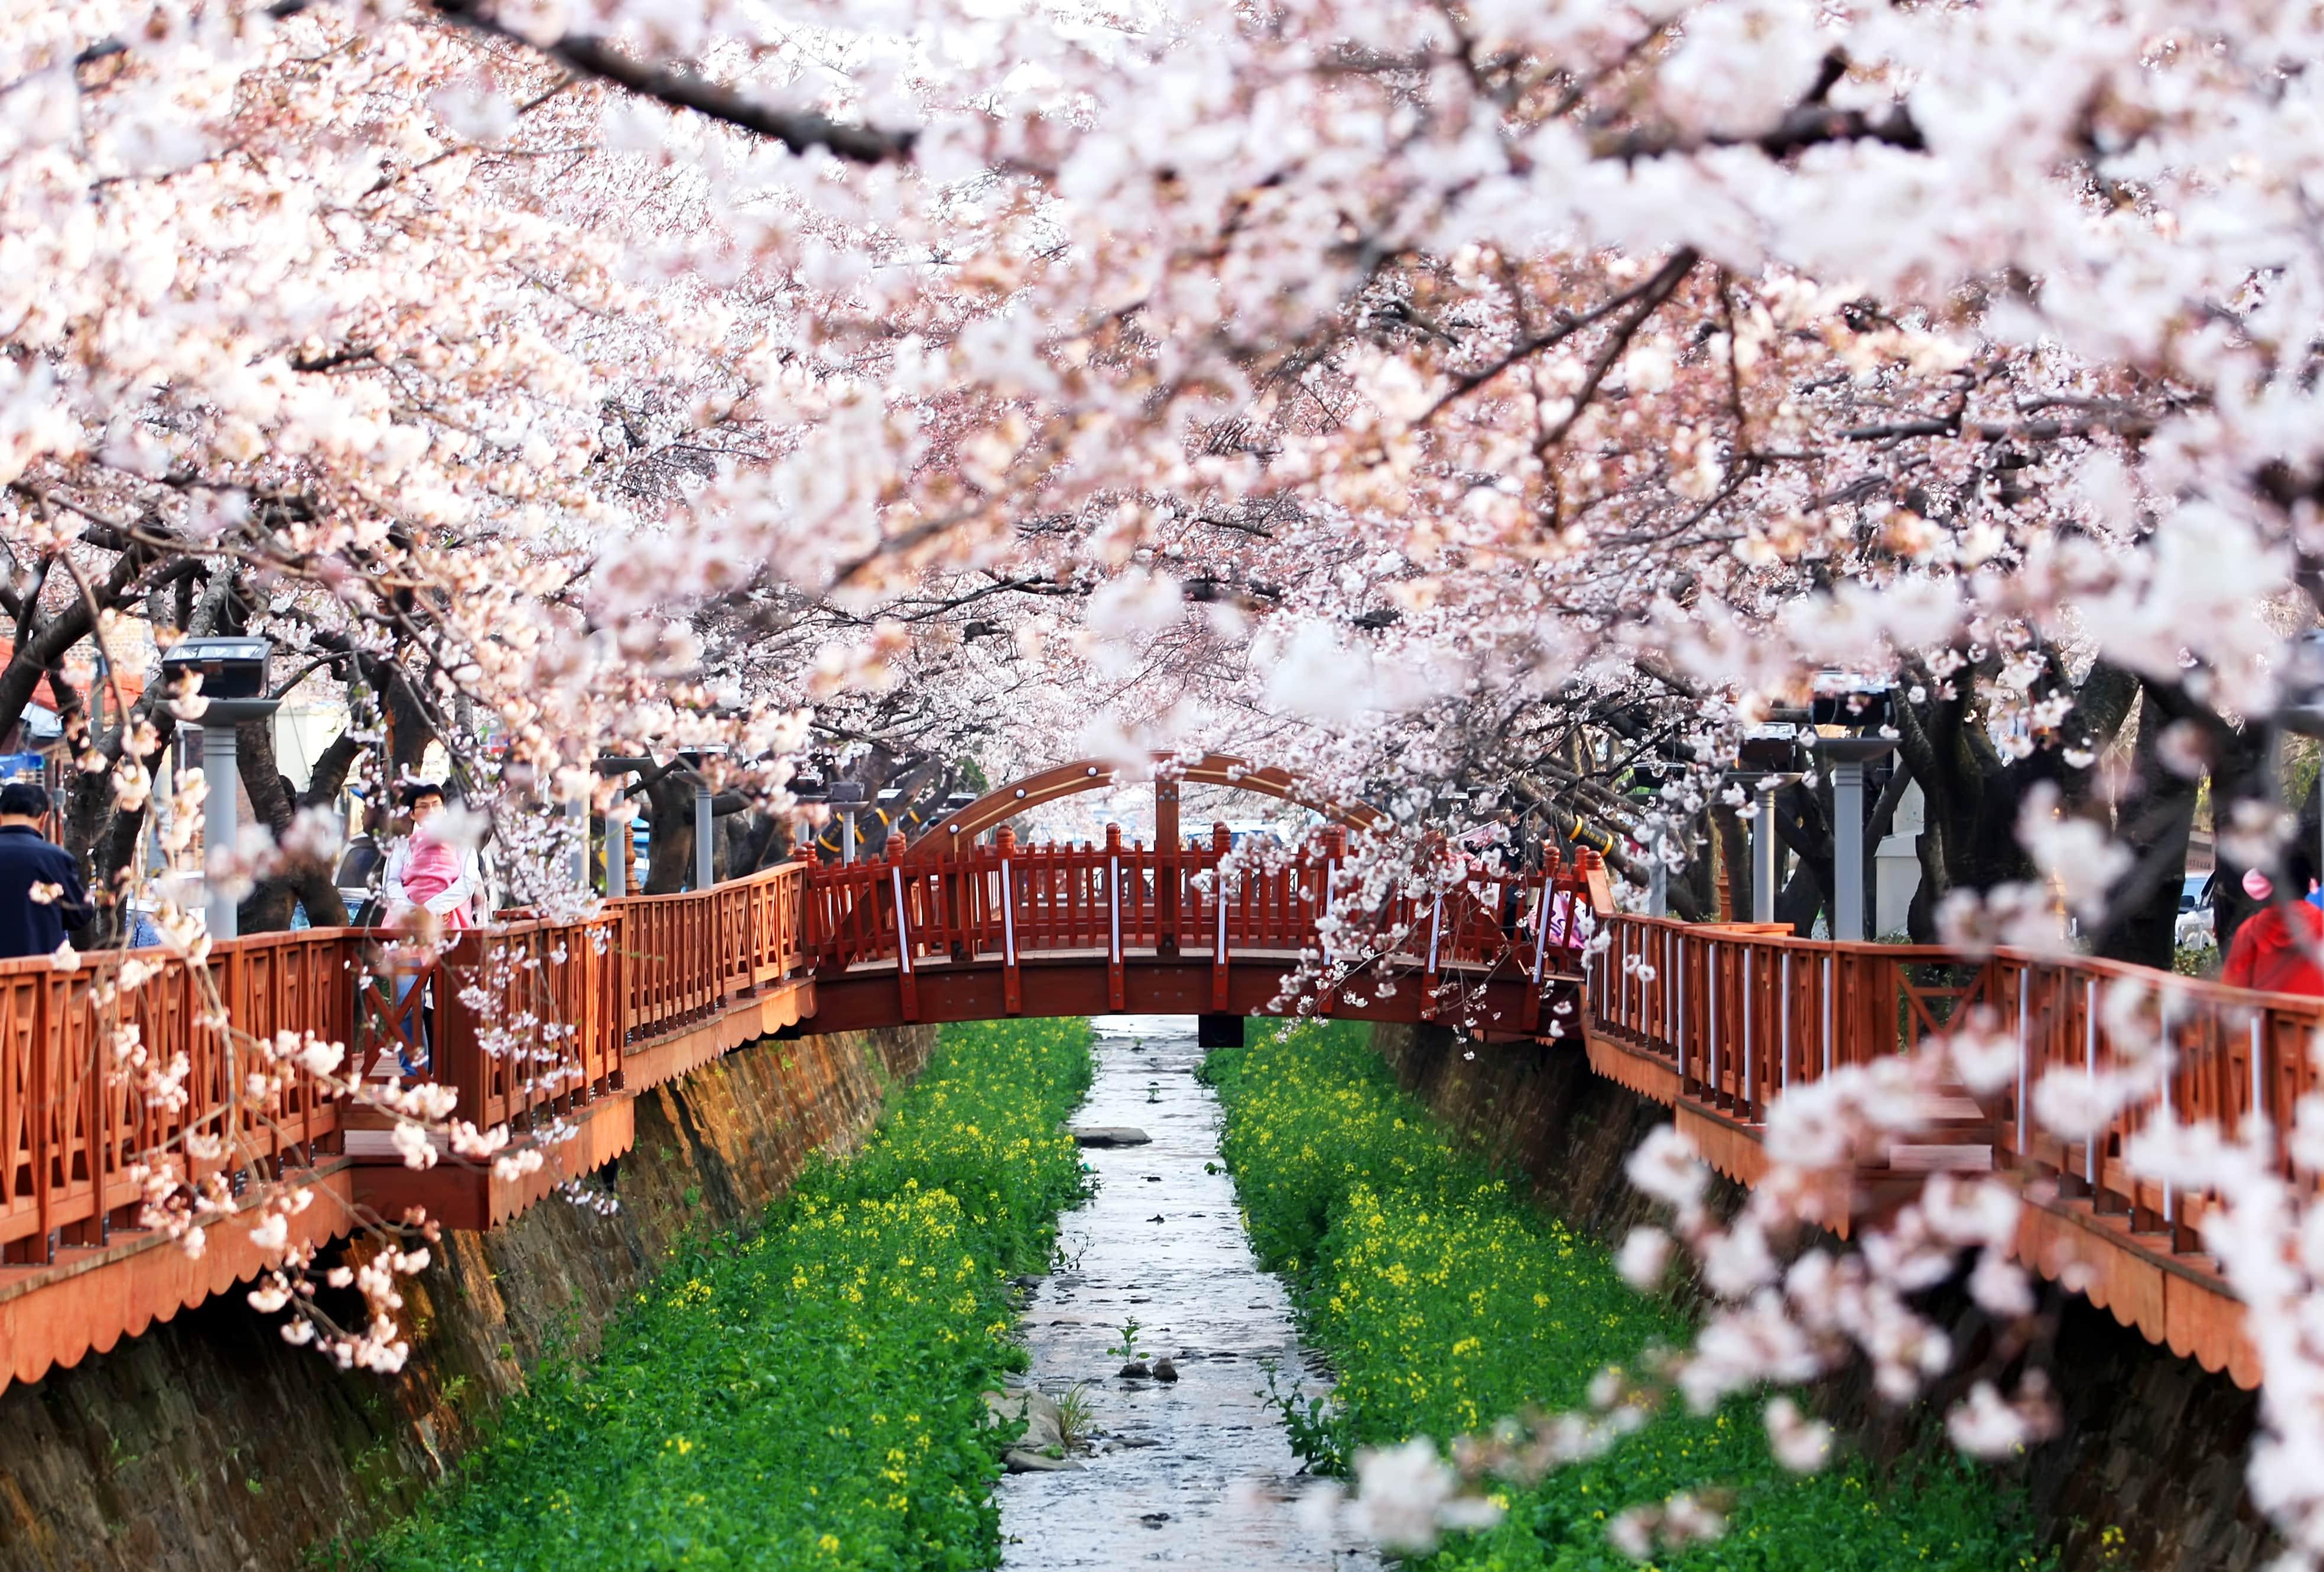 changwon-staden-och-cherry-blossom-festiva-secret-world